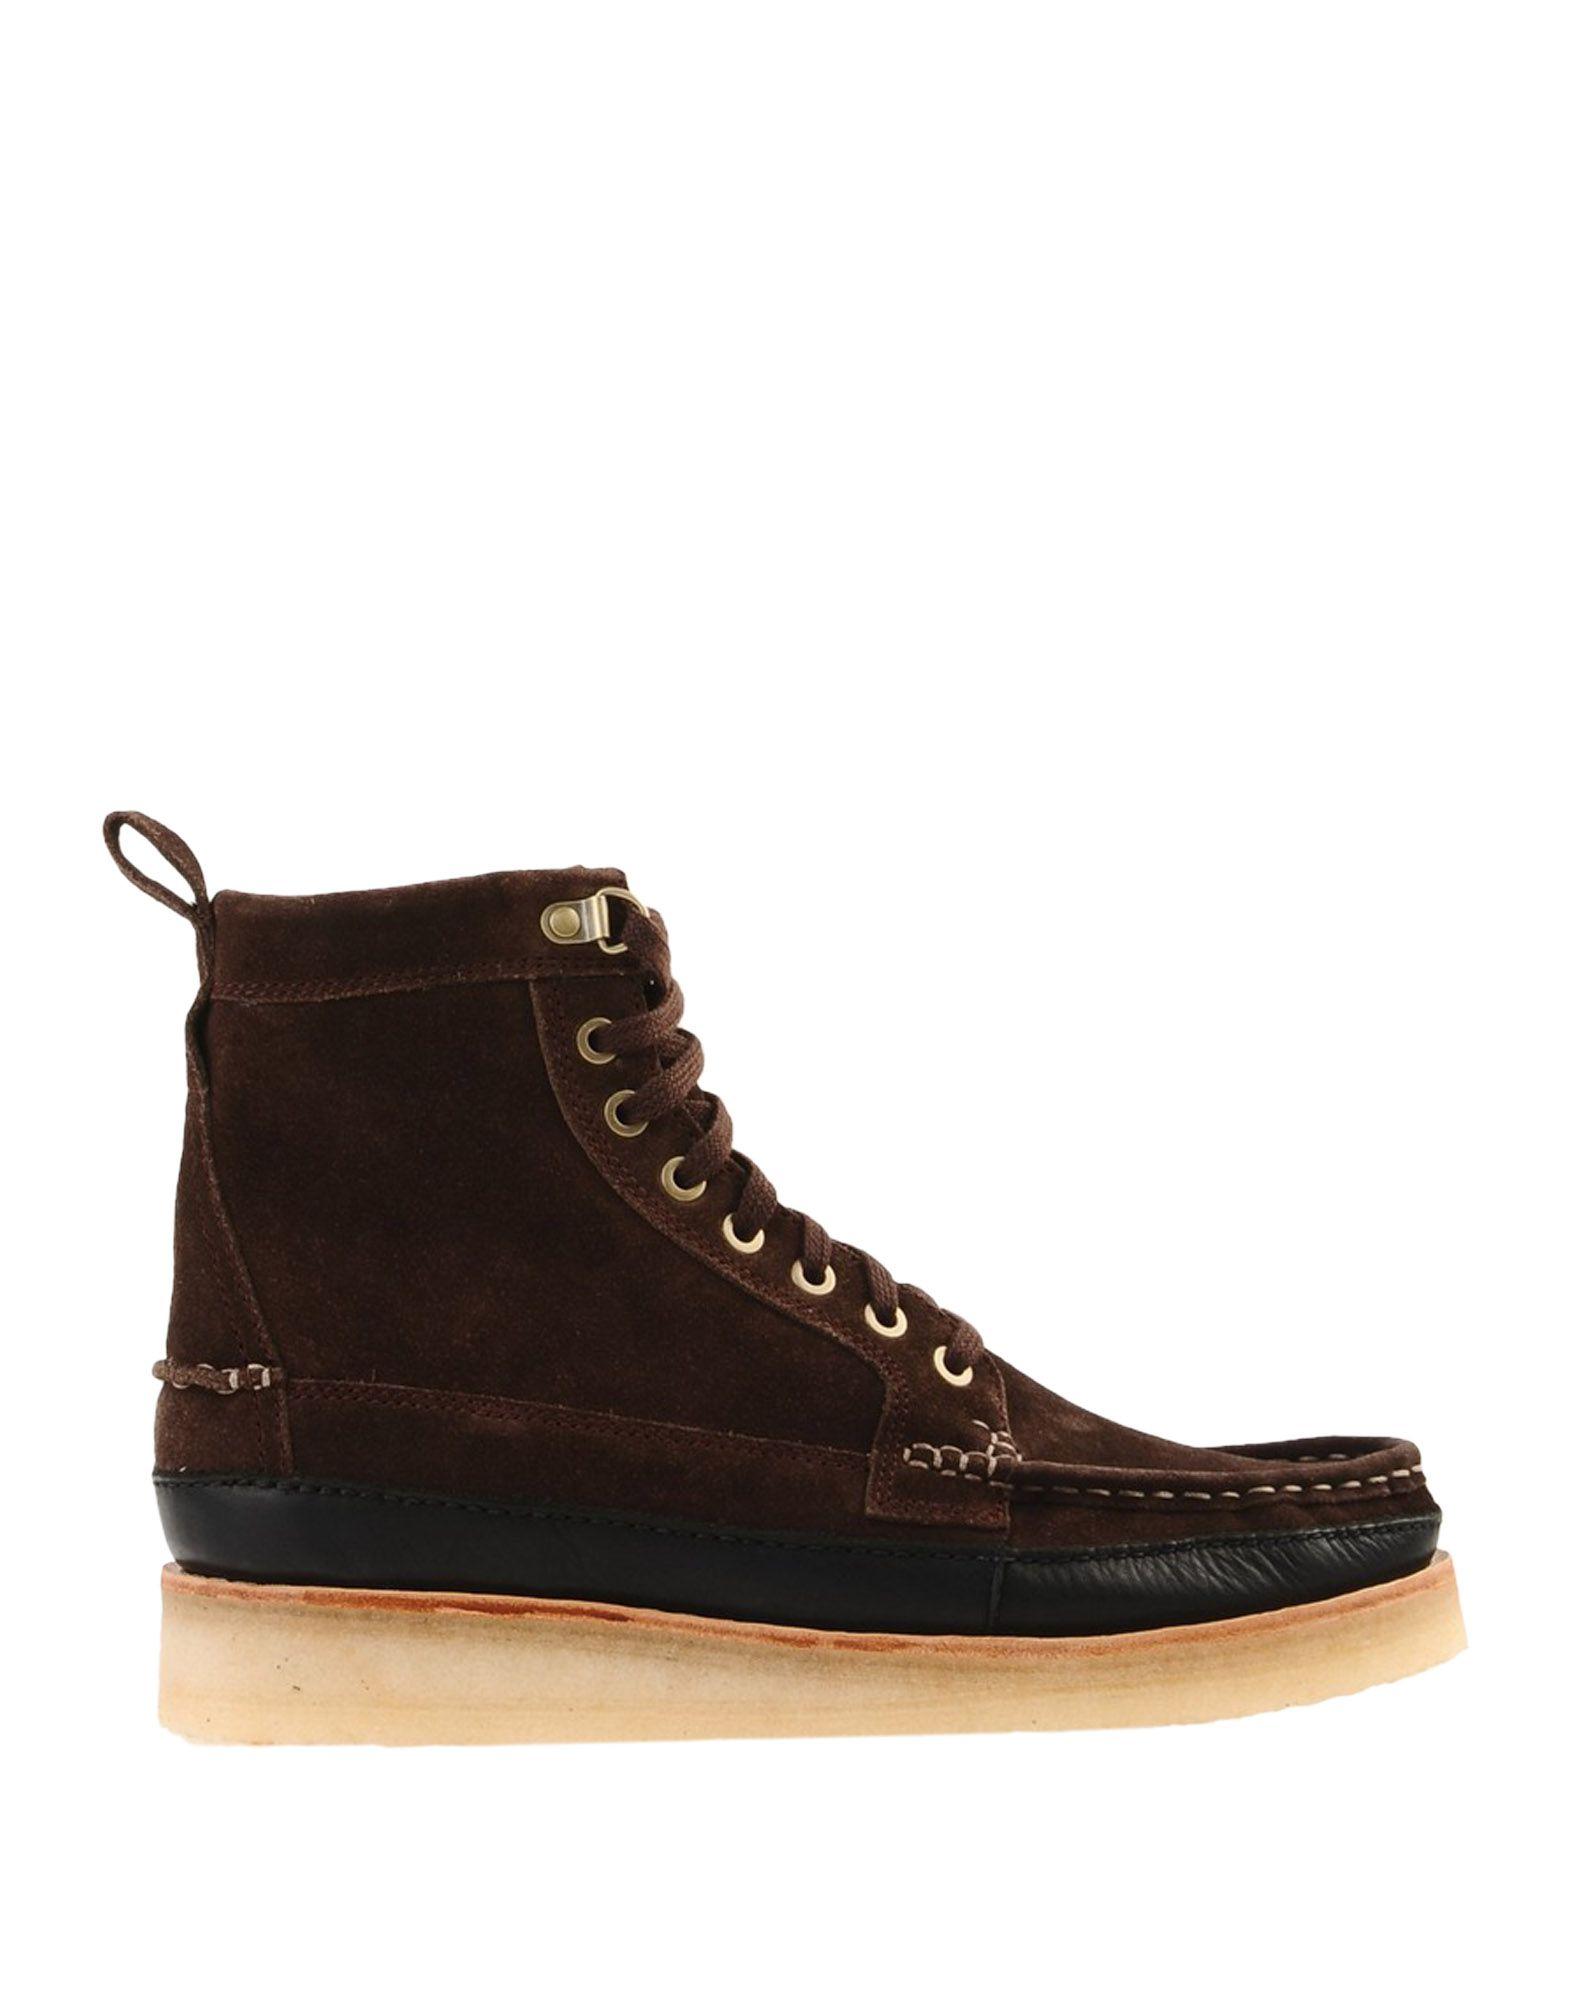 CLARKS ORIGINALS Полусапоги и высокие ботинки keep originals полусапоги и высокие ботинки